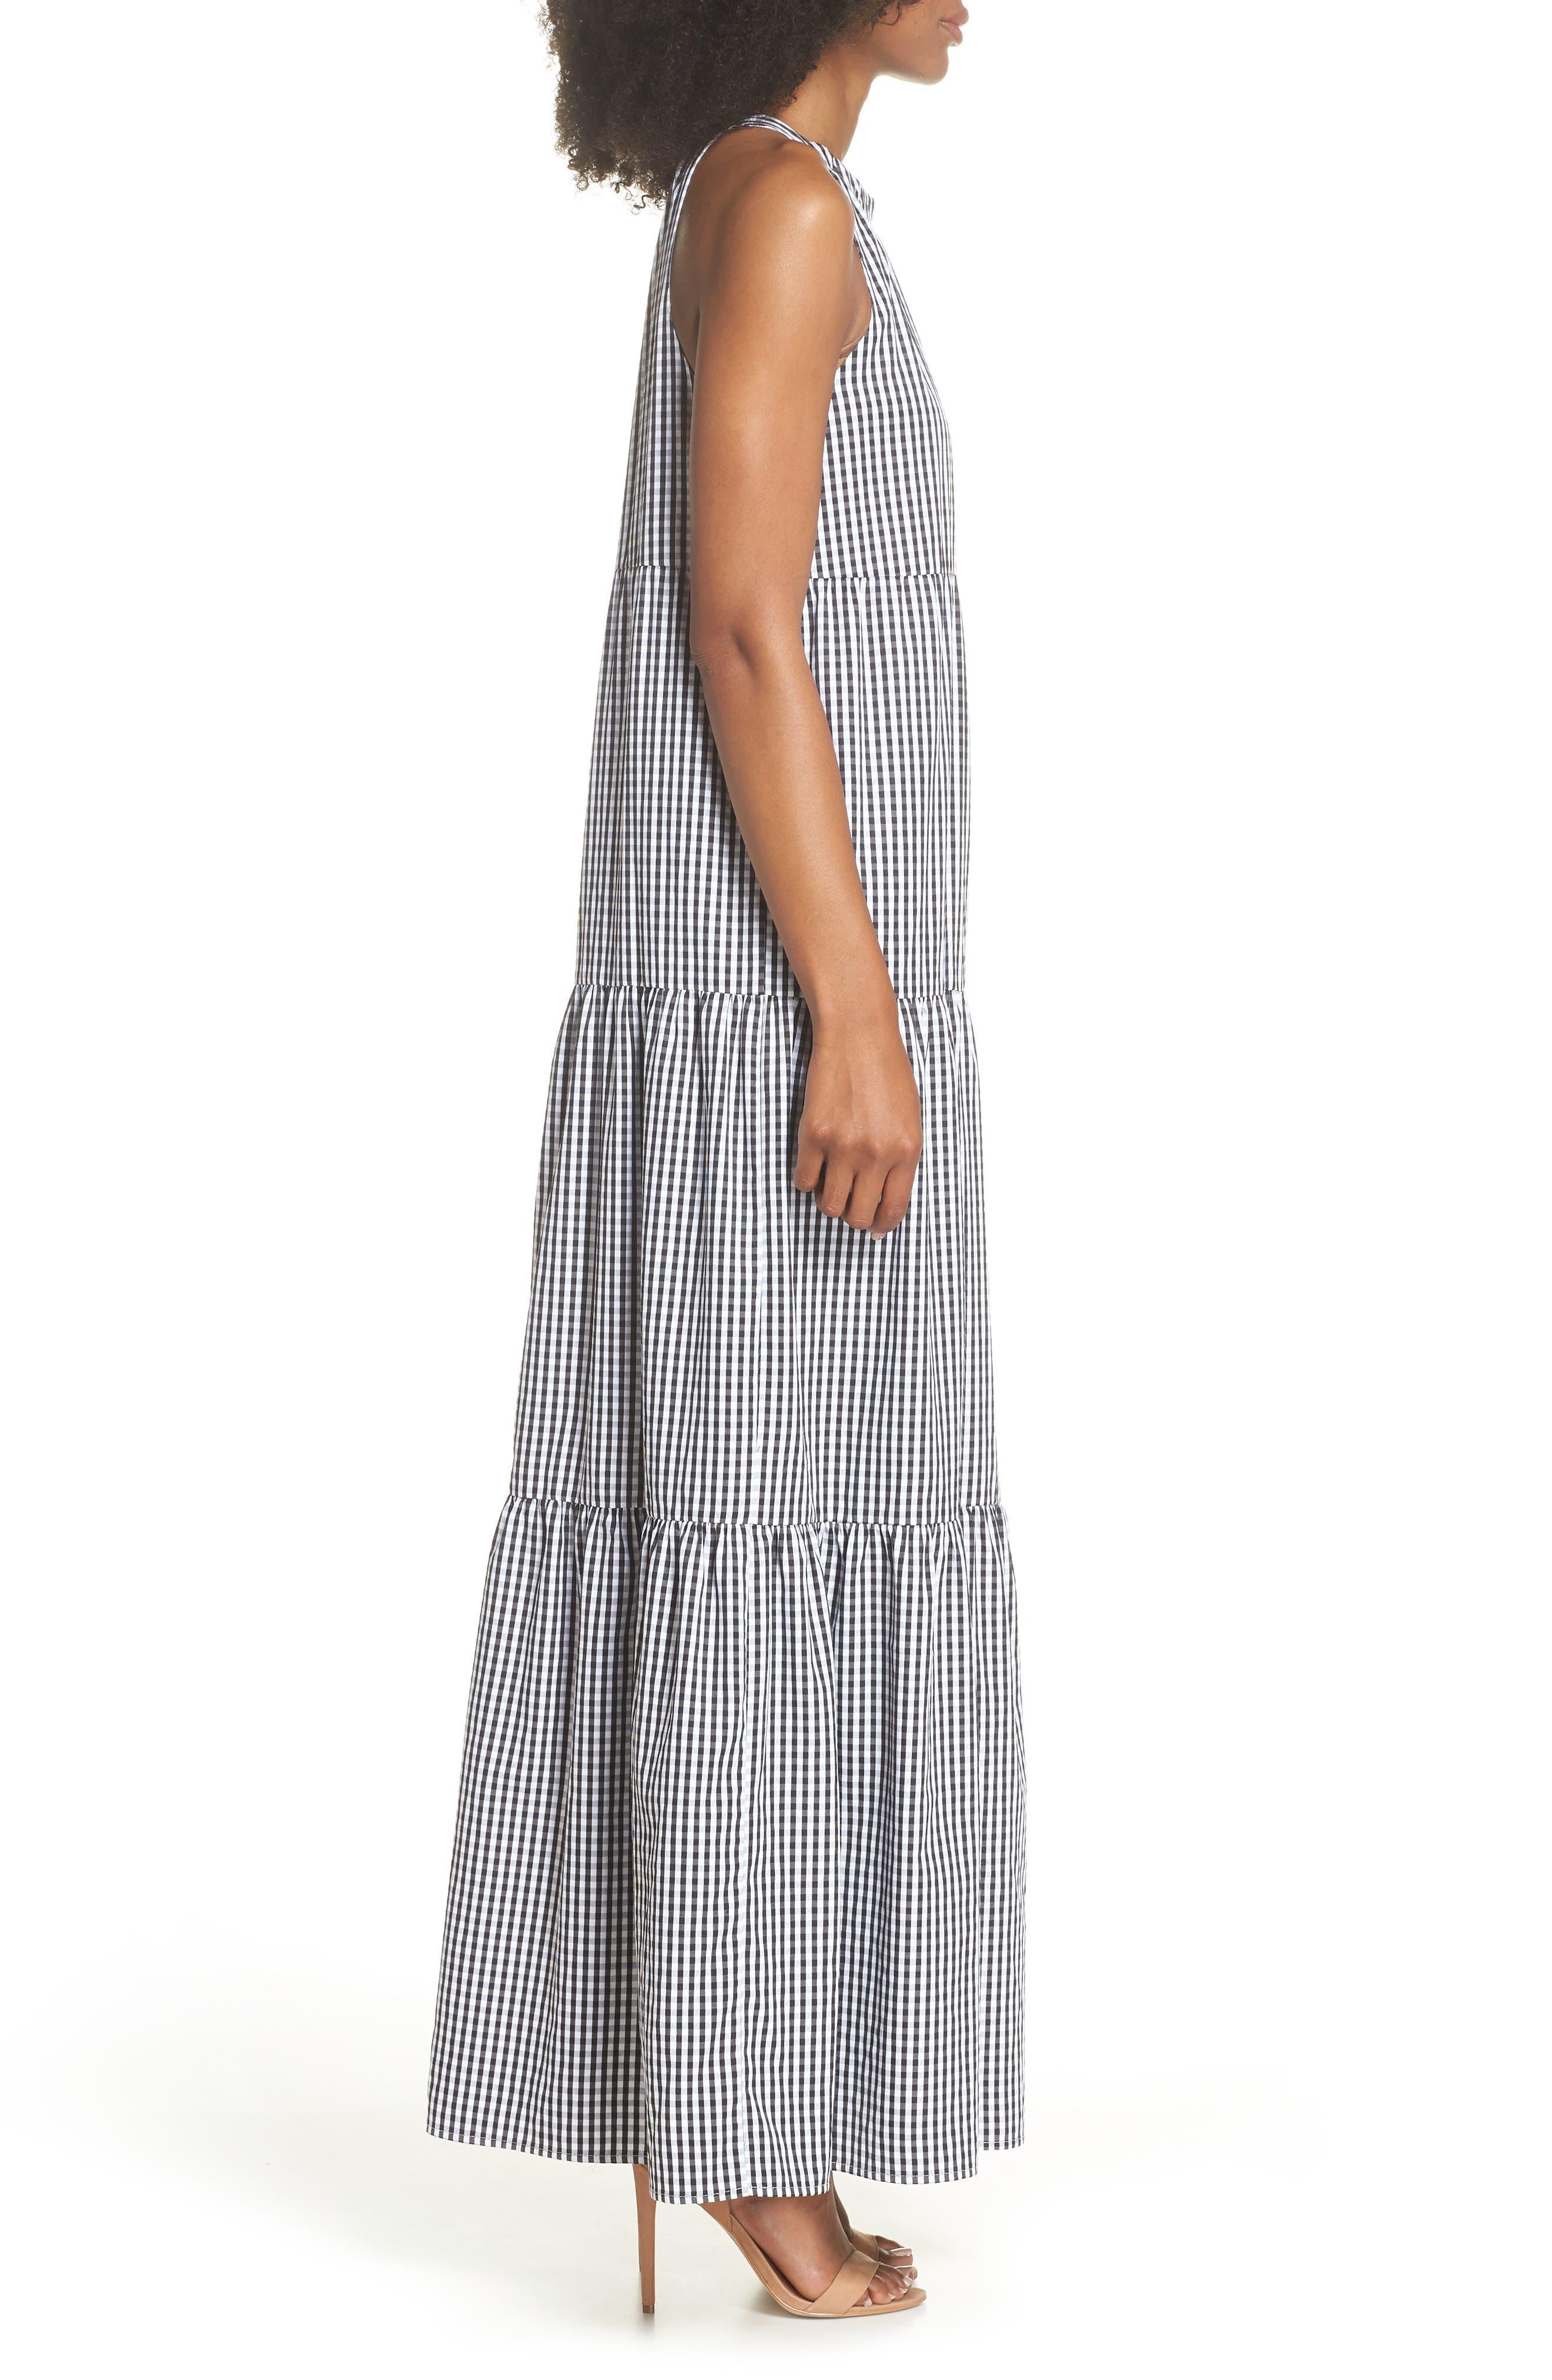 Gingham Check Maxi Dress,                             Alternate thumbnail 3, color,                             100